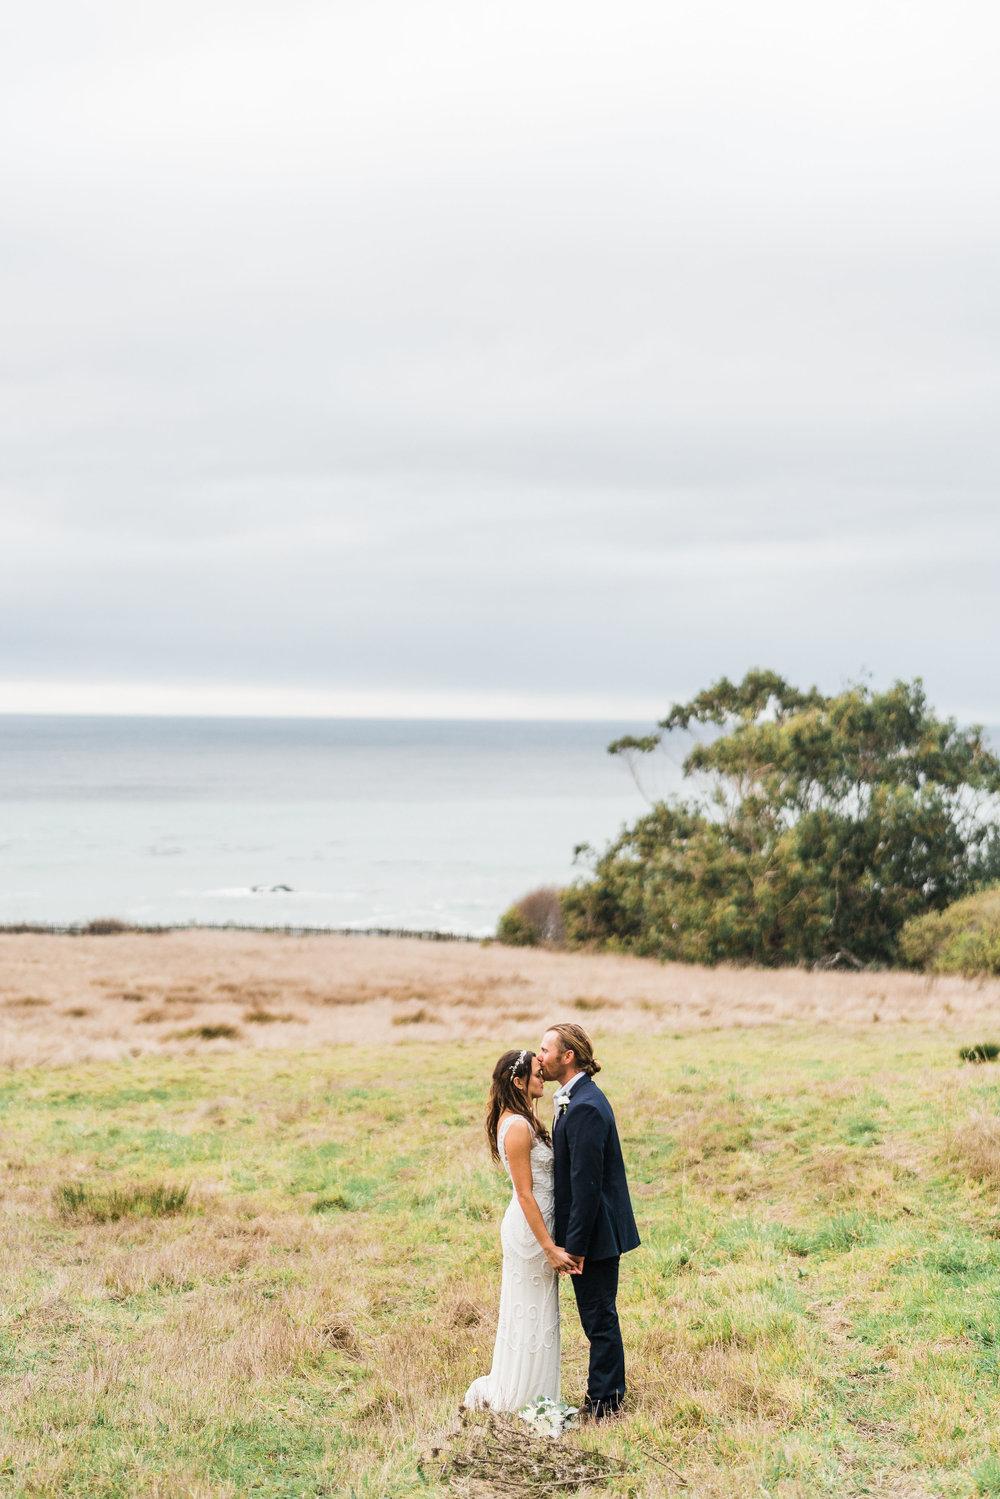 switzer-farm-wedding-westport-brandon-bibbins-photograhy-fine-art-067.jpg